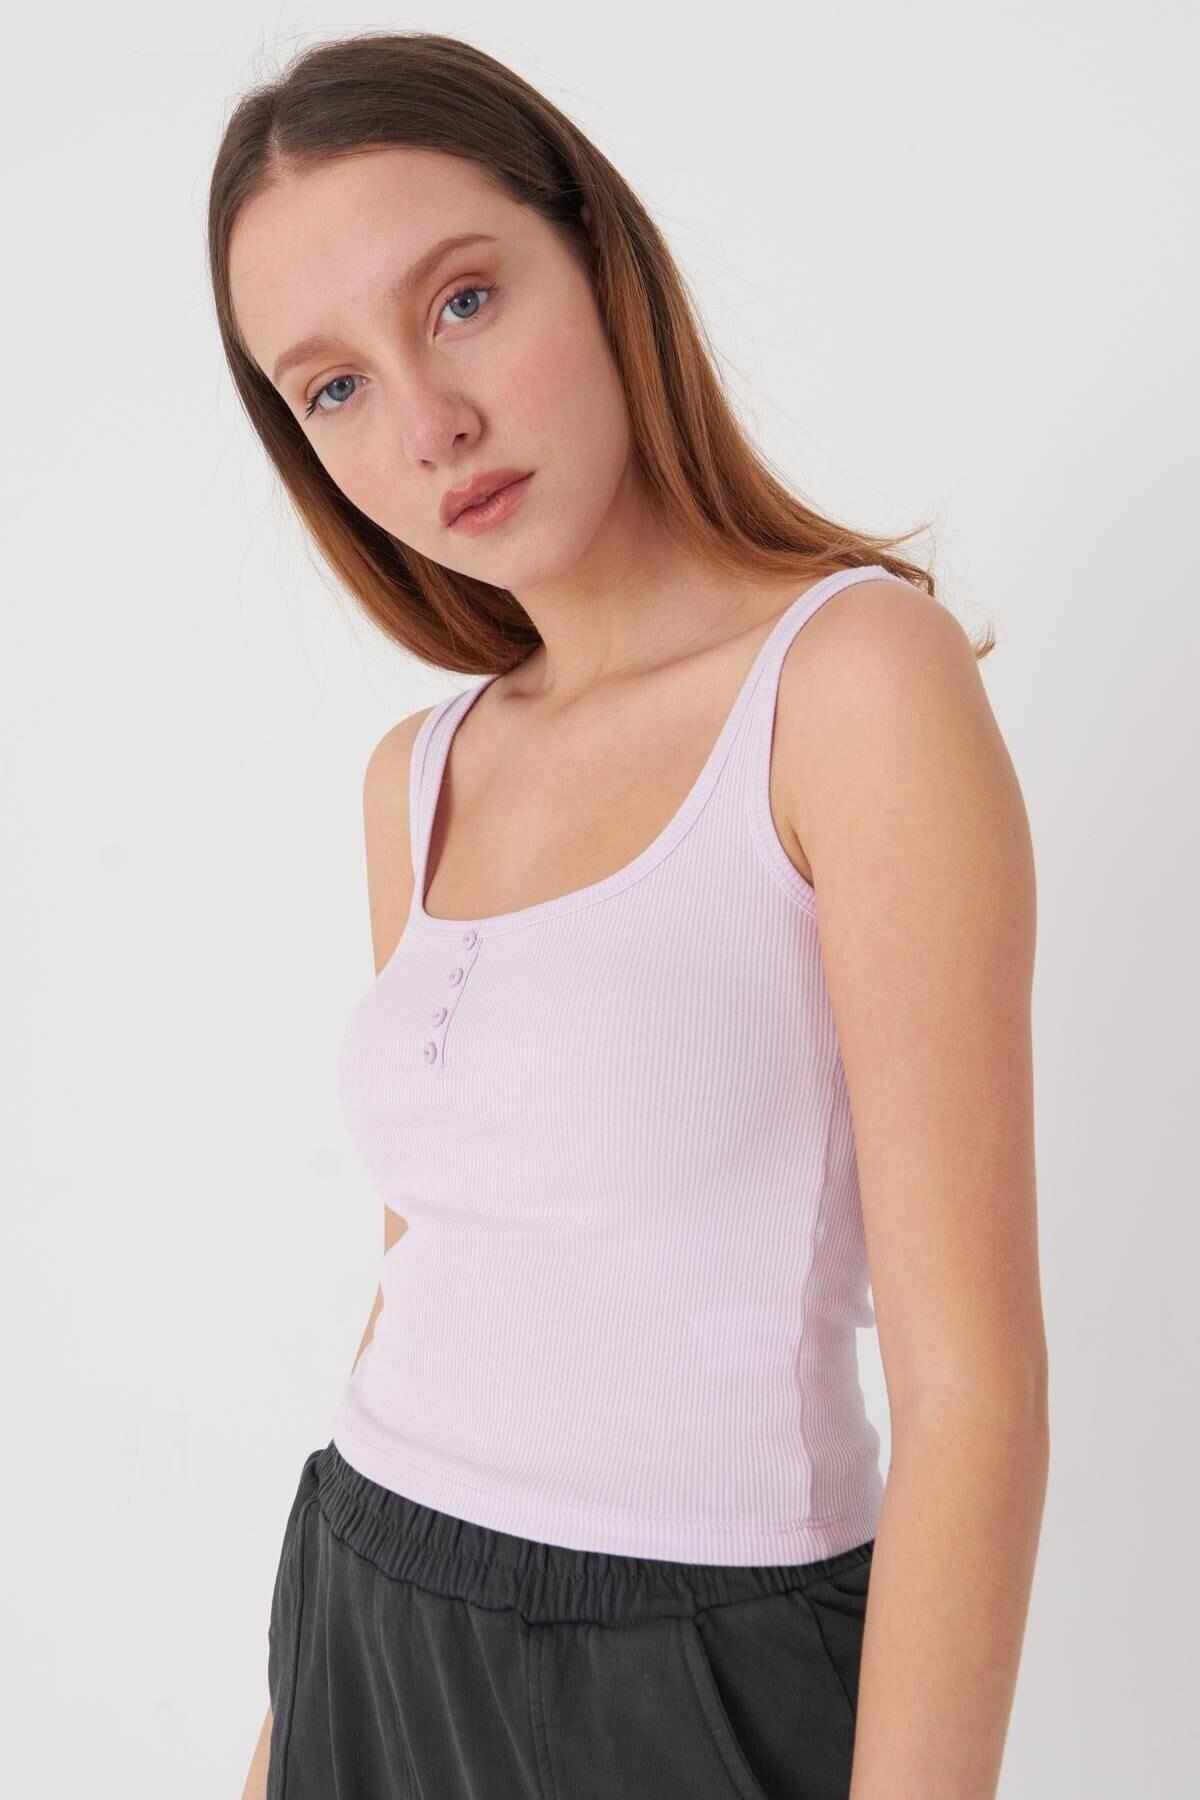 Addax Kadın Açık Lila Askılı Bluz A0963 - Dk11 Adx-0000022397